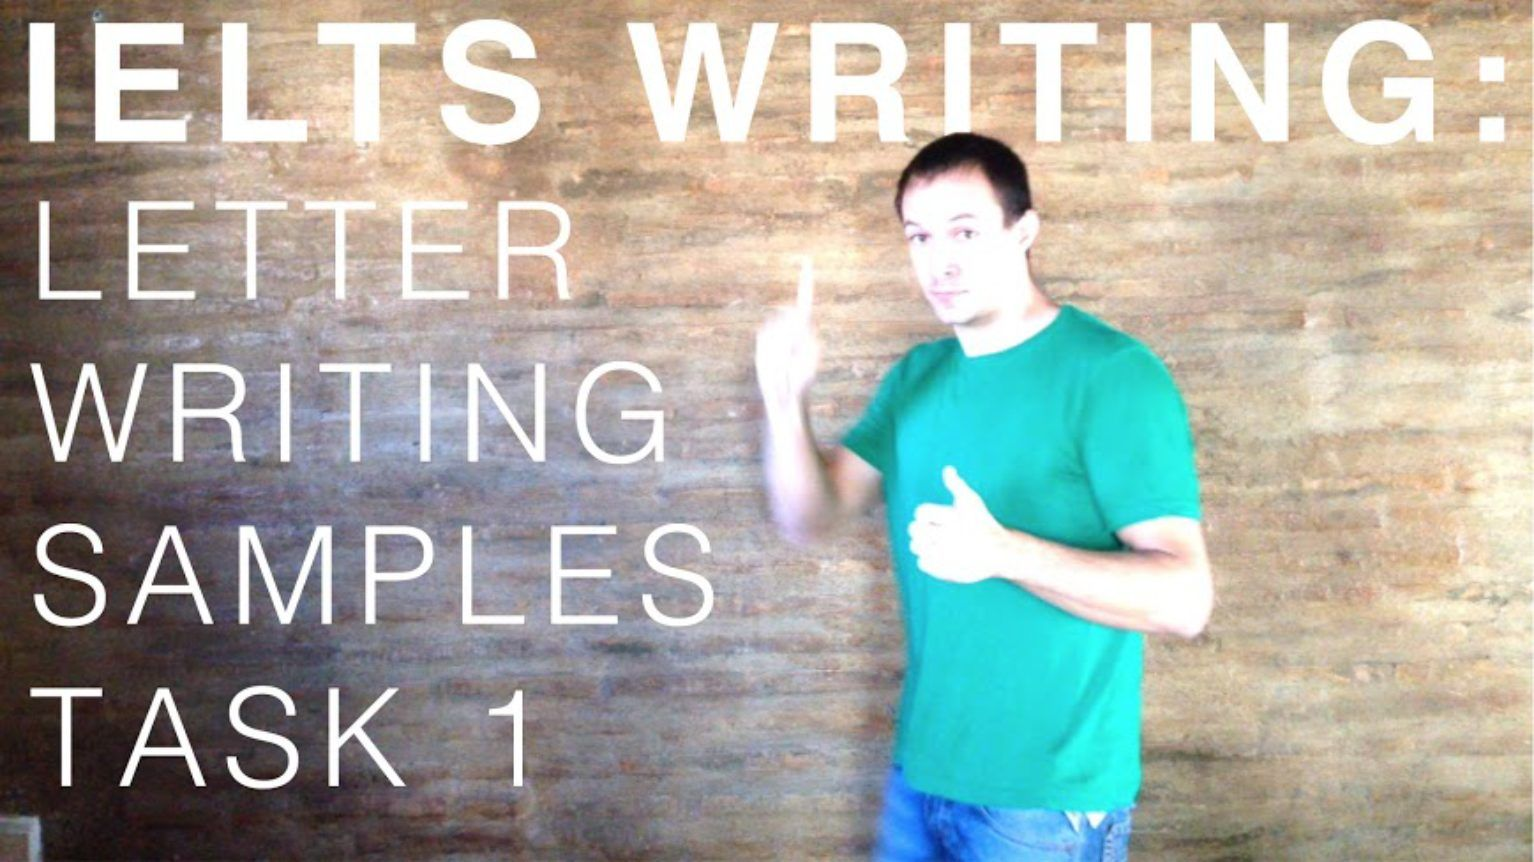 IELTS General Writing Task 1 Samples, Phrases & Tips